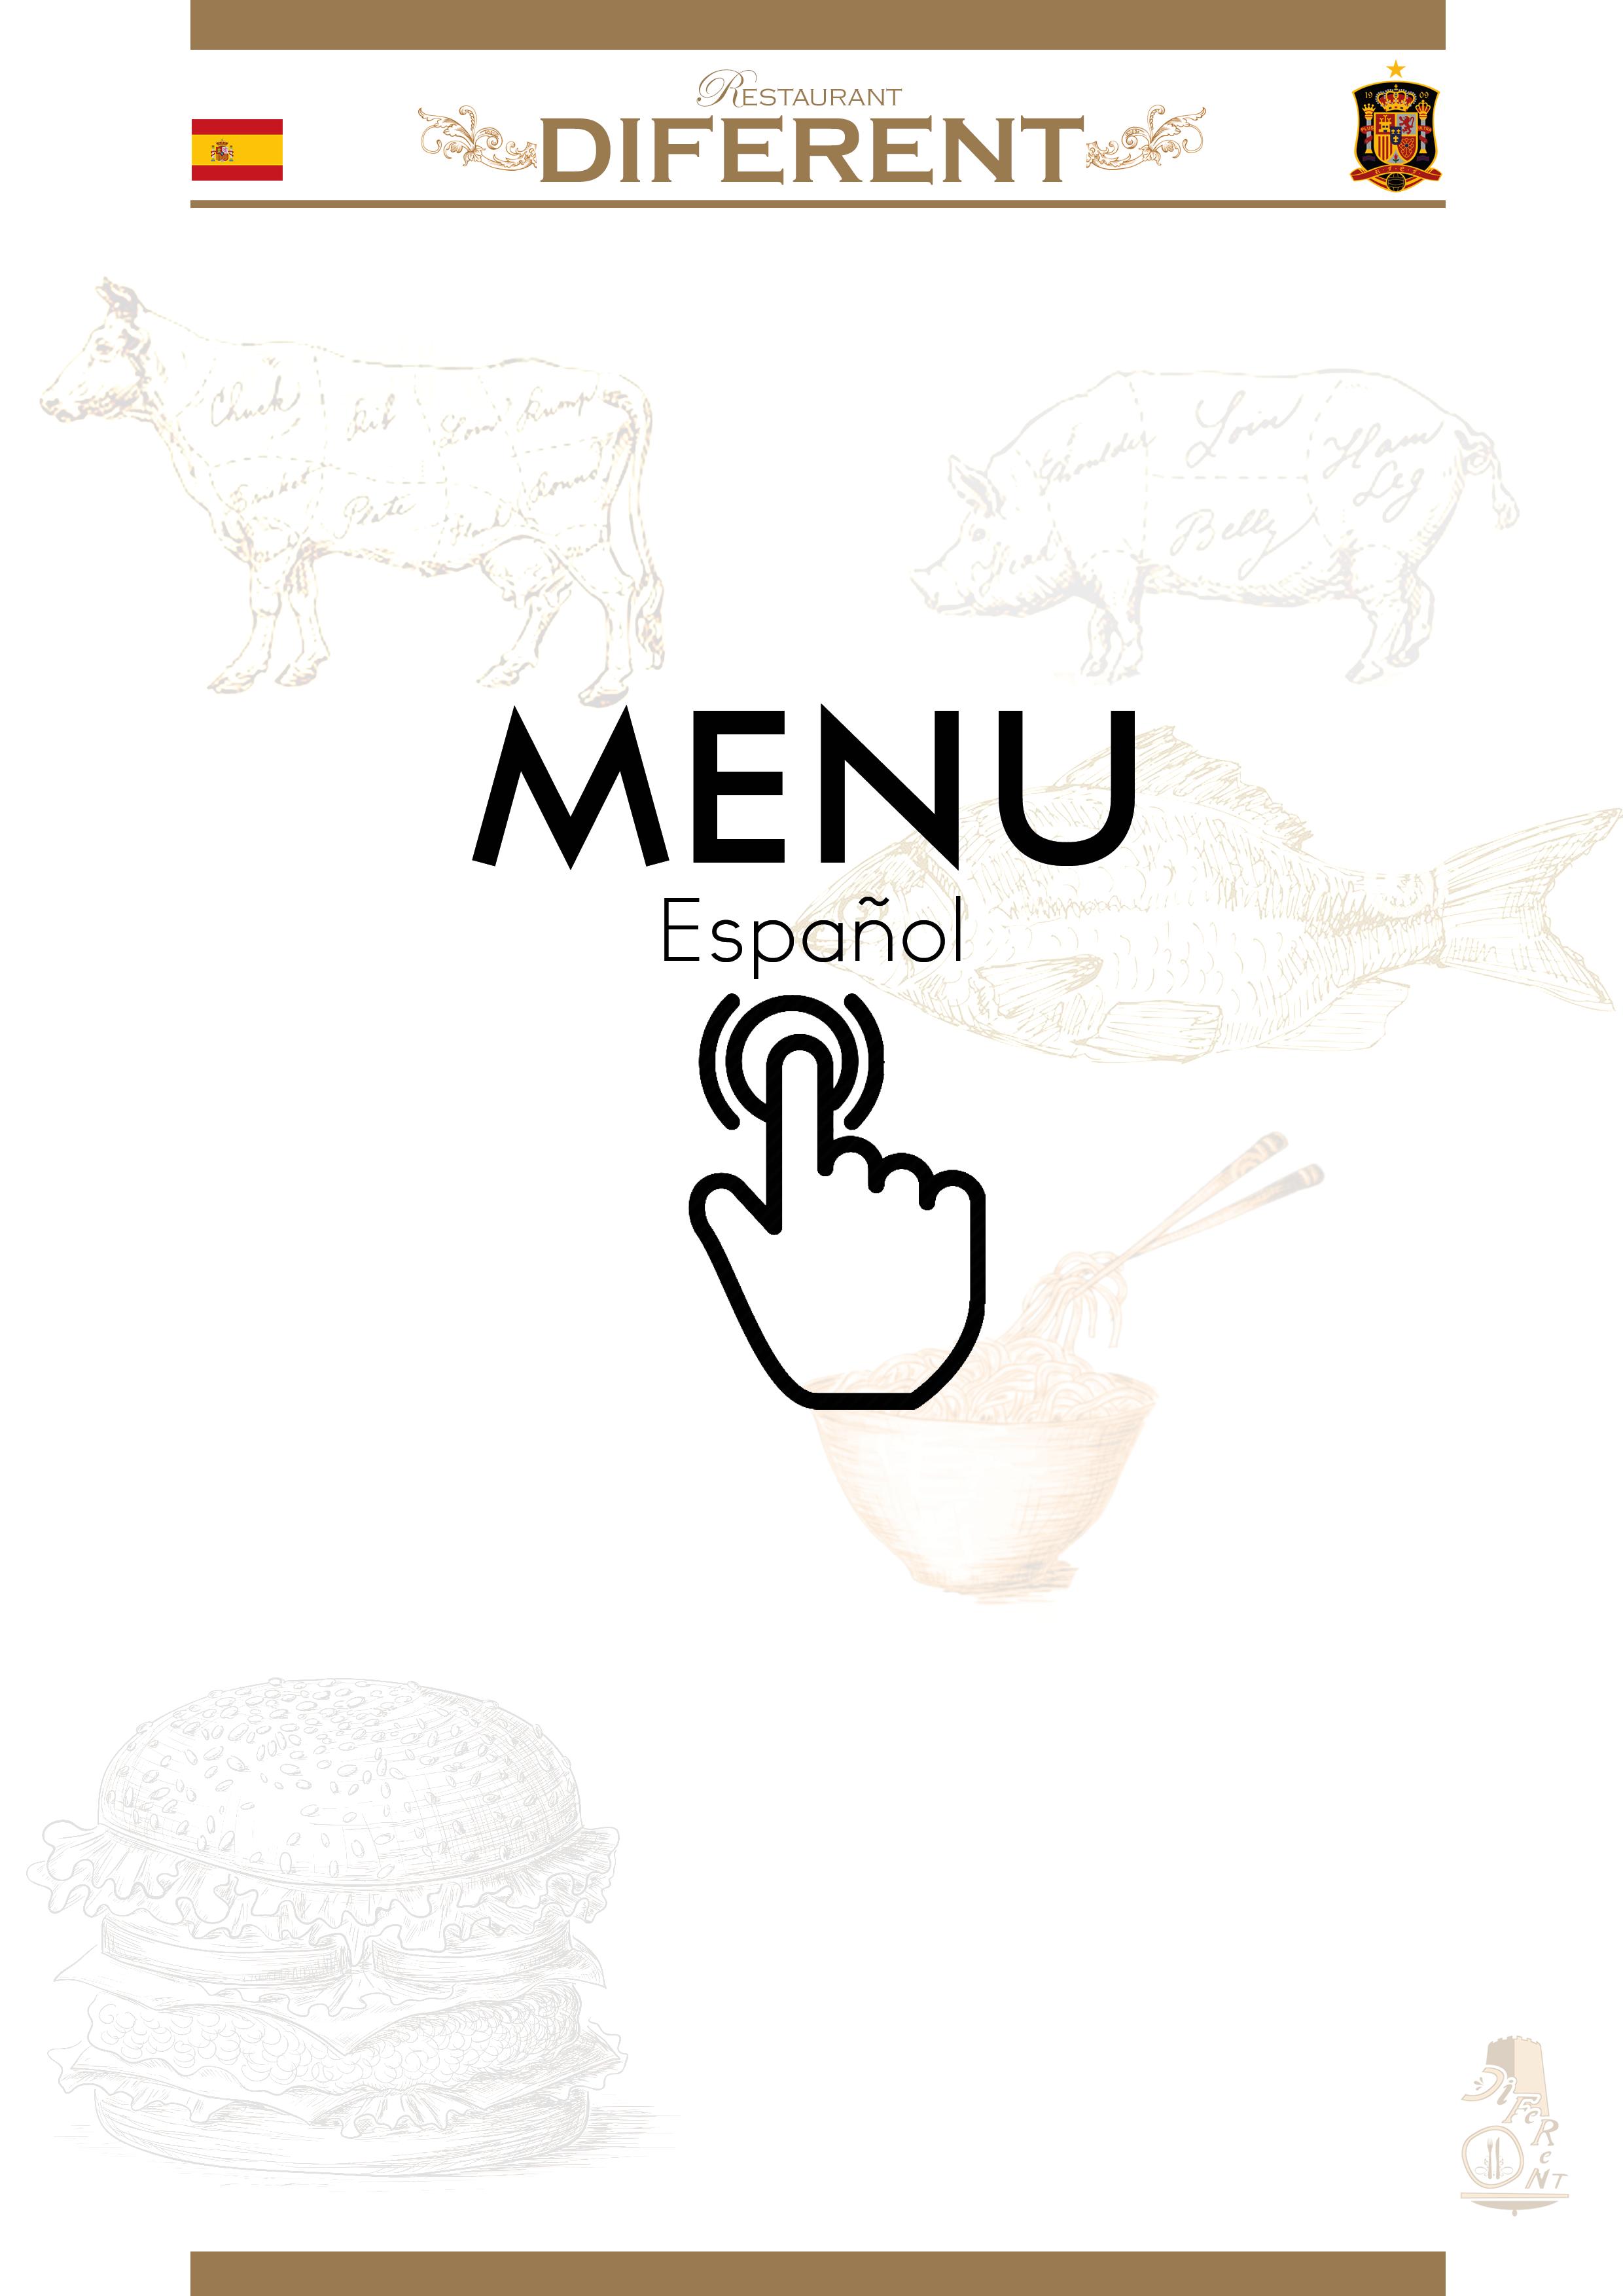 diferent_menu_ES_no_prices